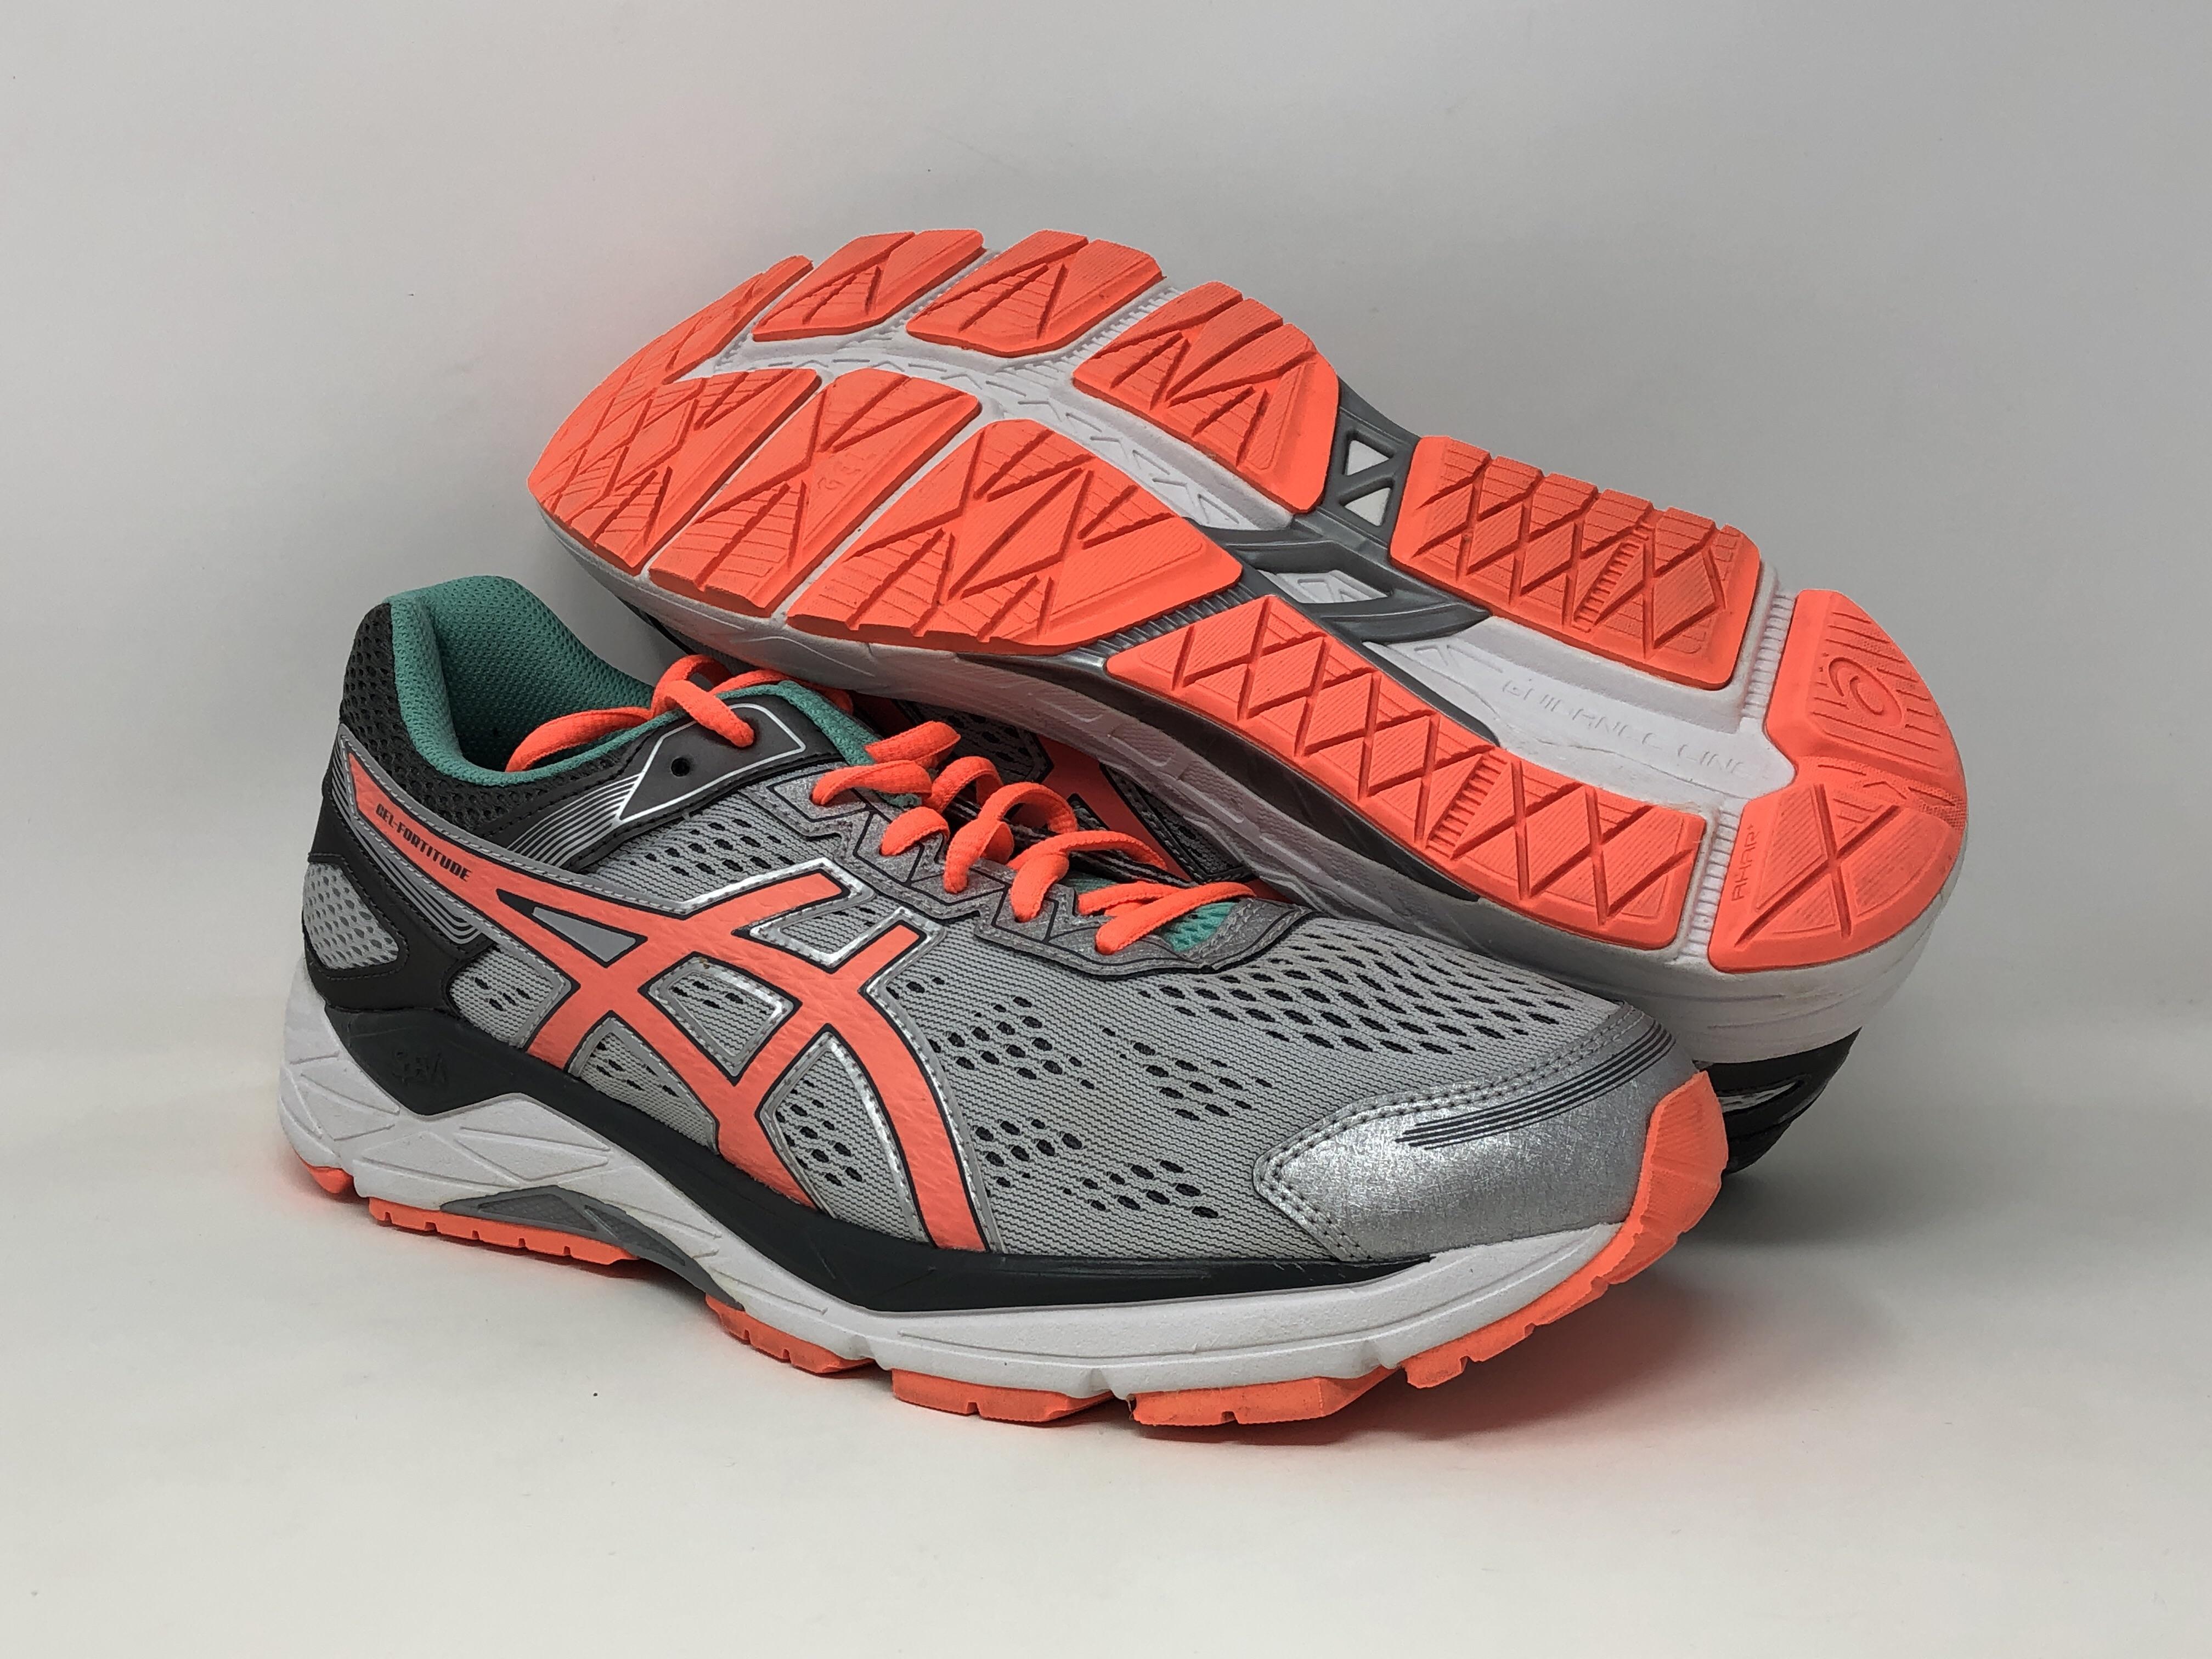 Details about ASICS Women's Gel Fortitude 7 Running Shoe, SilverCoralAqua Mint, 11 D(W) US